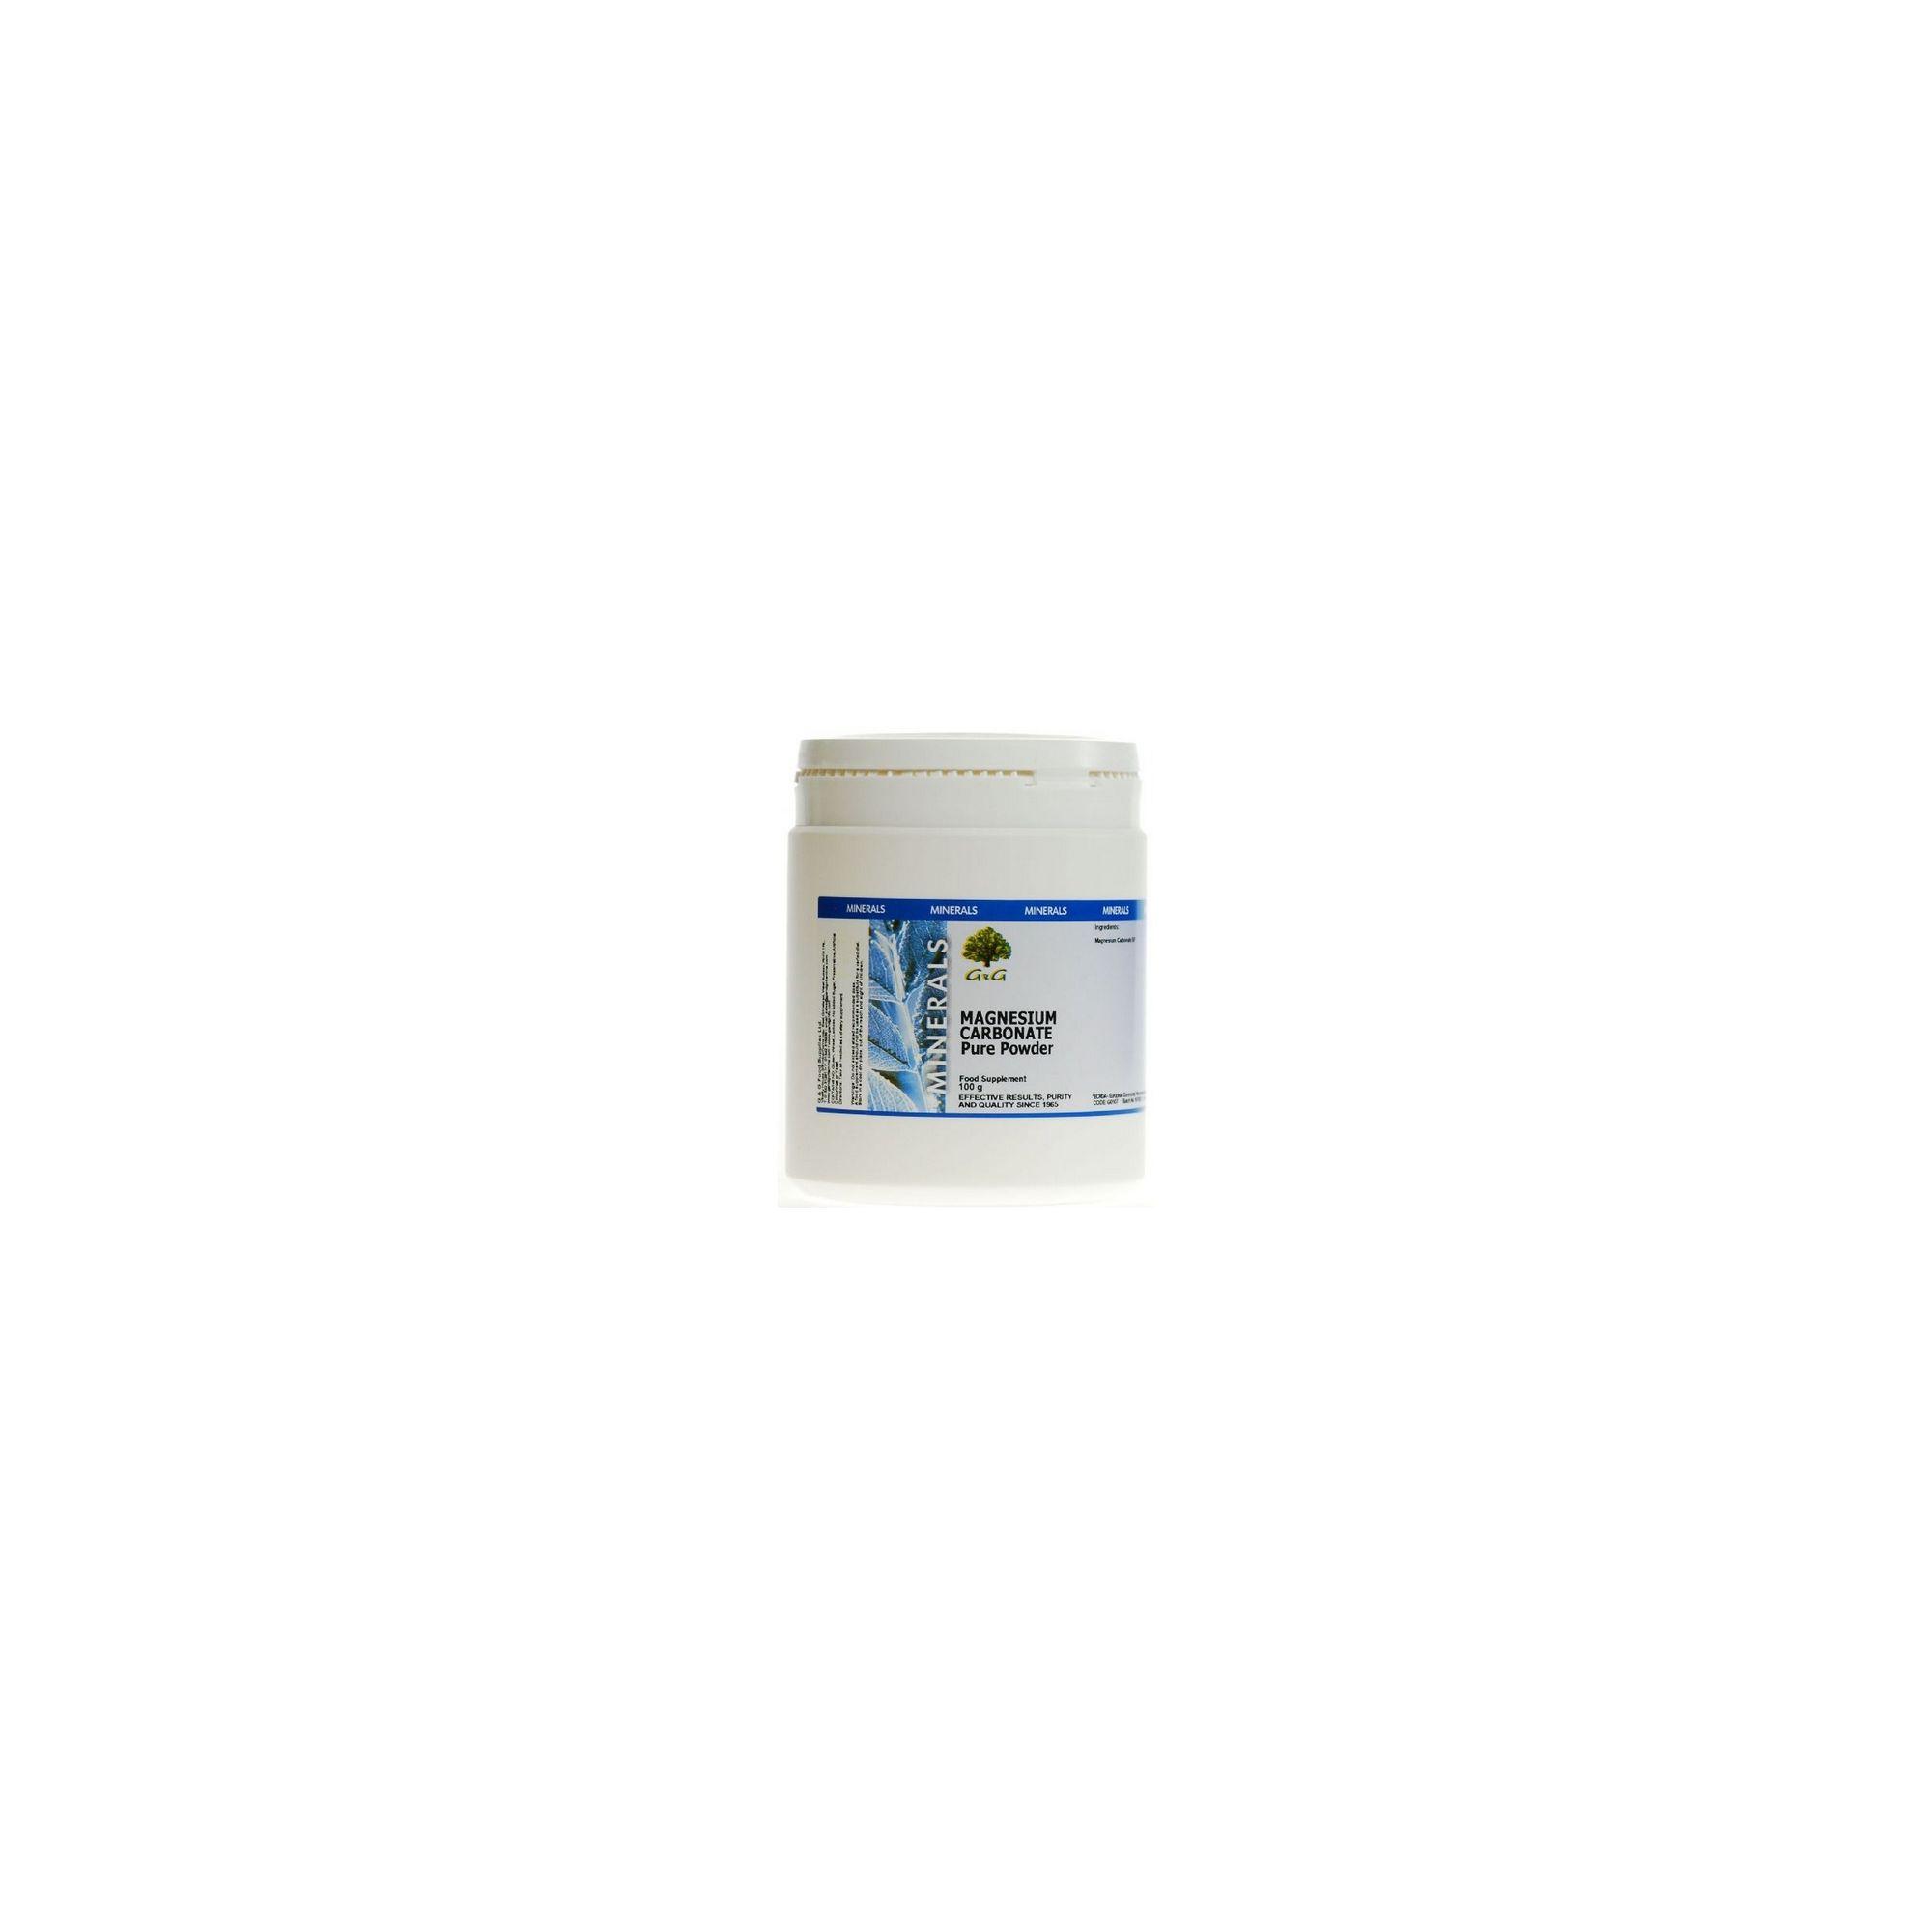 g-g-magnesium-carbonate-powder-100g-powder